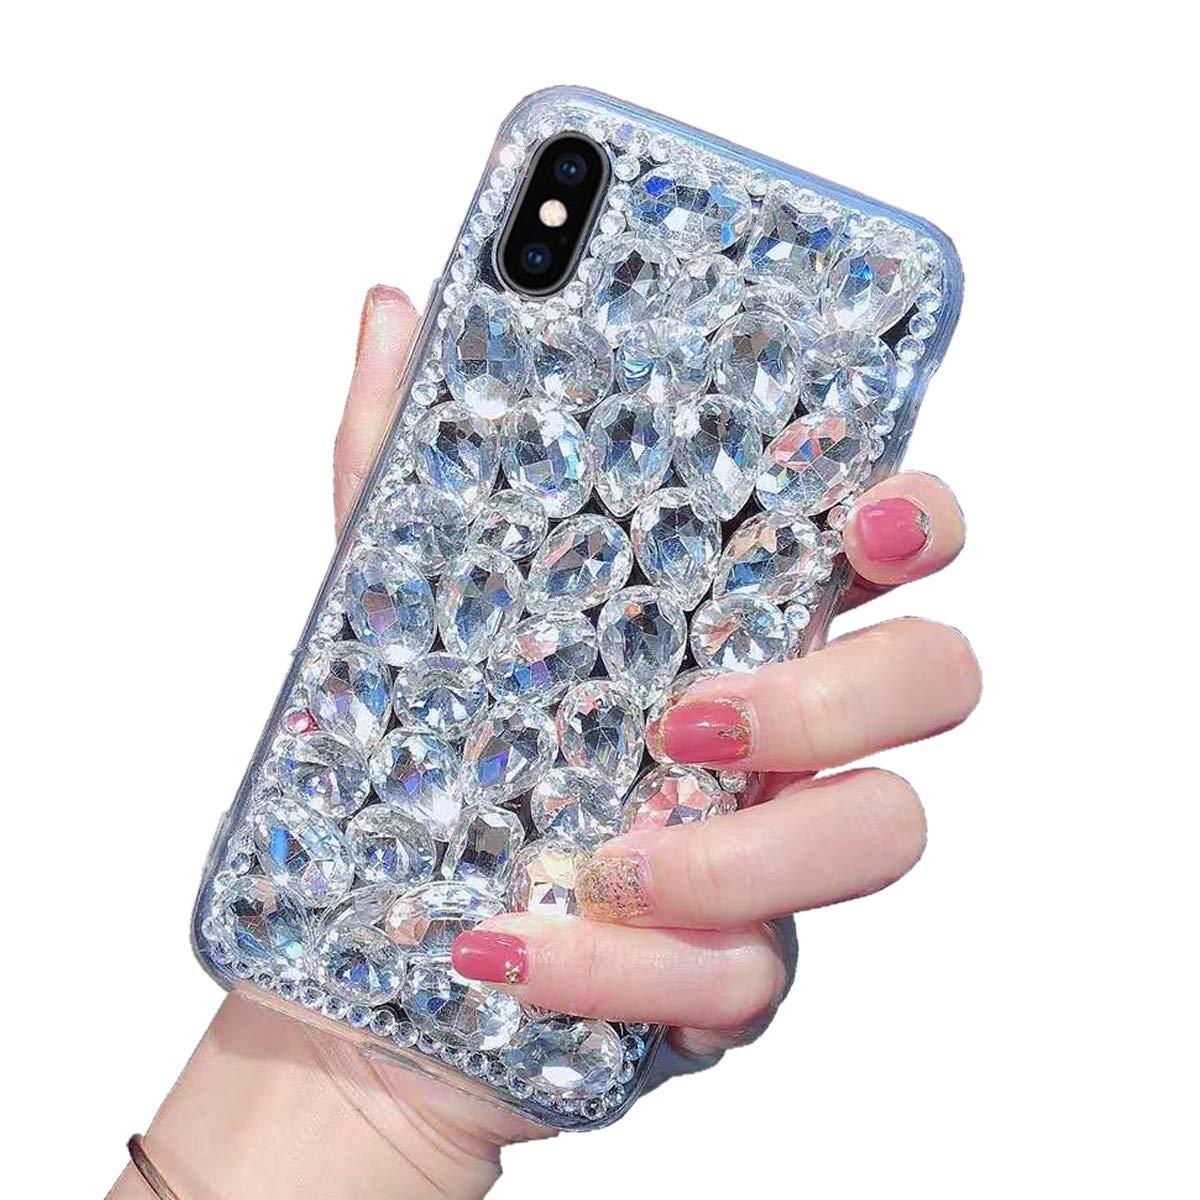 Luxus Glitzer Hülle für Galaxy J5 2017, Misstars 3D Bling Diamant Handyhülle Transparent Hart PC Rückschale mit Silikon TPU Rahmen Schutzhülle für Samsung Galaxy J5 2017 SM-J530F, Silber